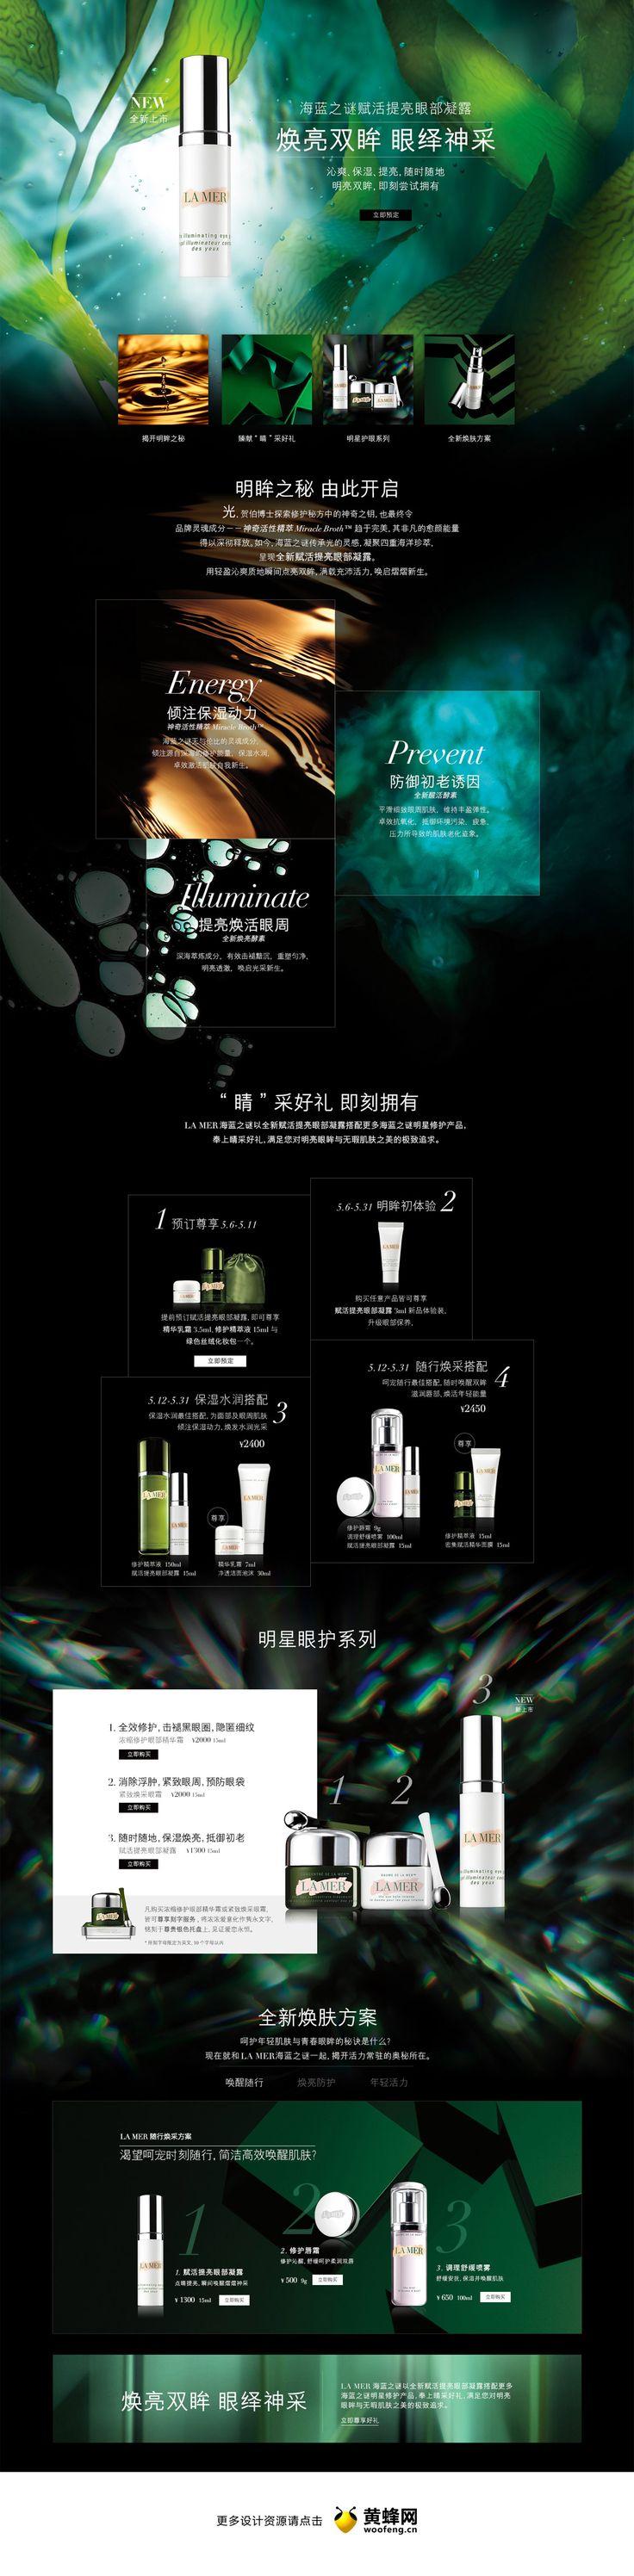 IEG新品首发化妆品专题,来源自黄蜂网http://woofeng.cn/